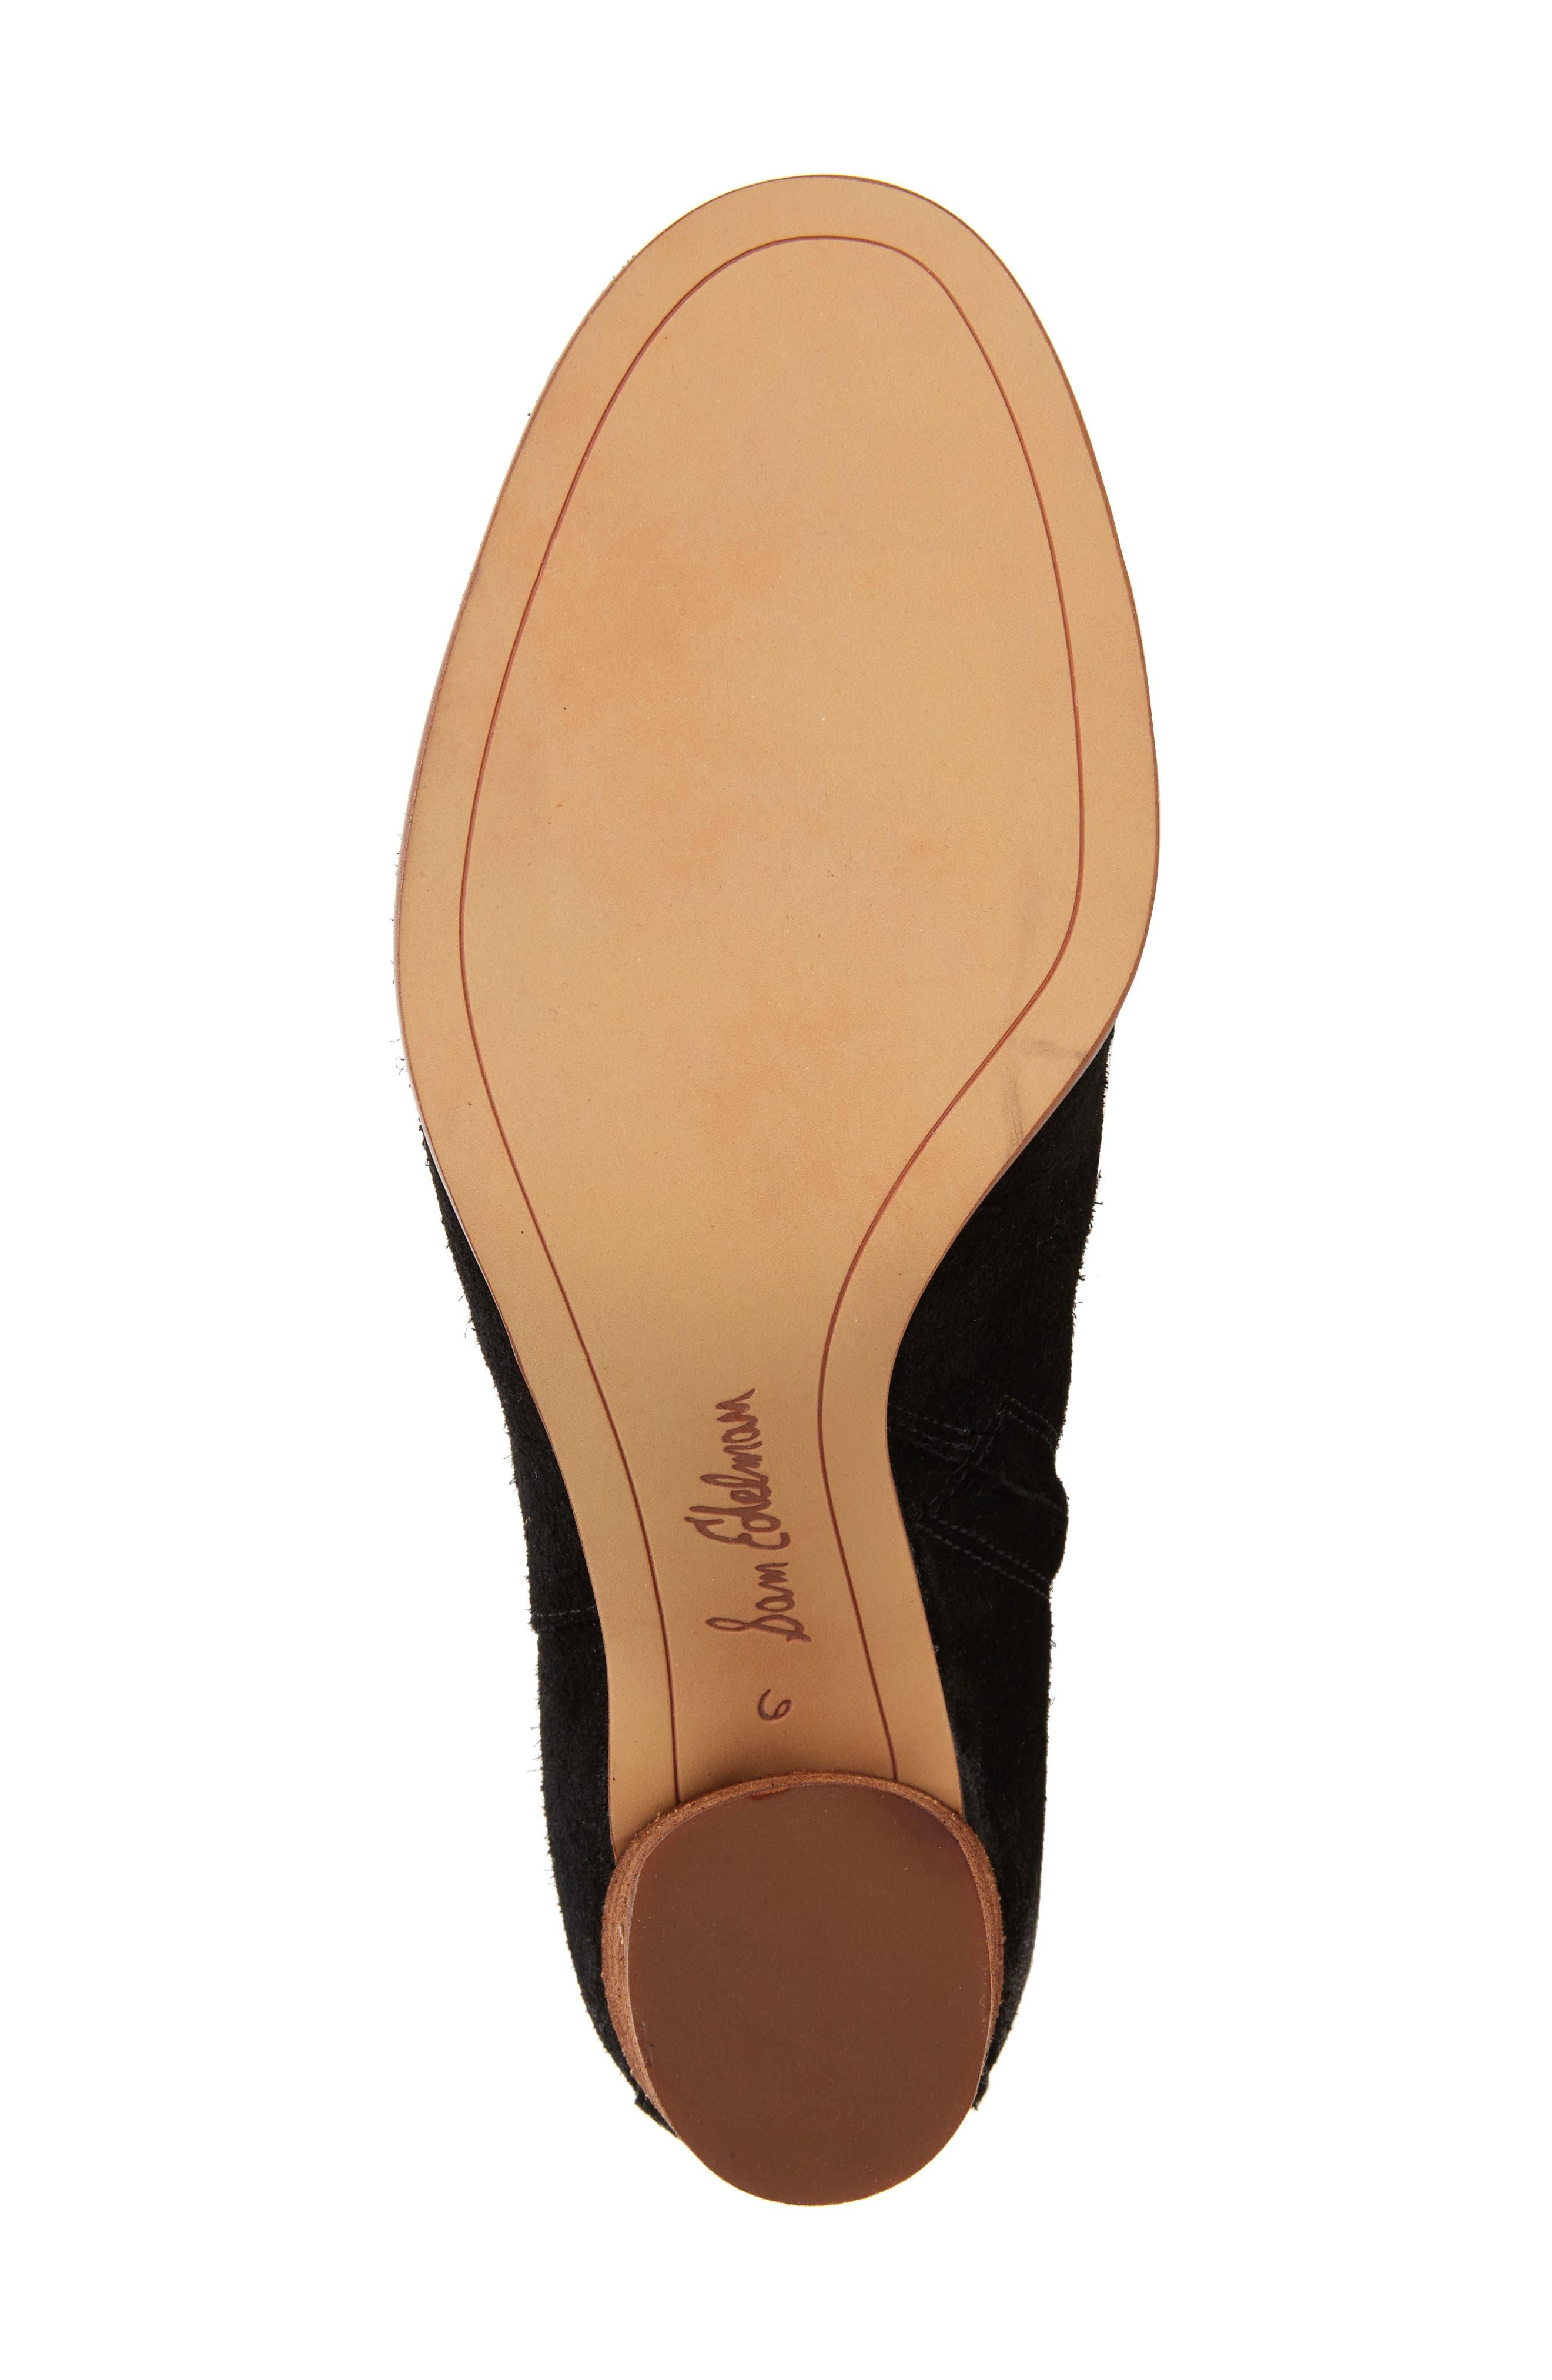 SAM EDELMAN, Camellia Tall Boot, Alternate thumbnail 6, color, 002